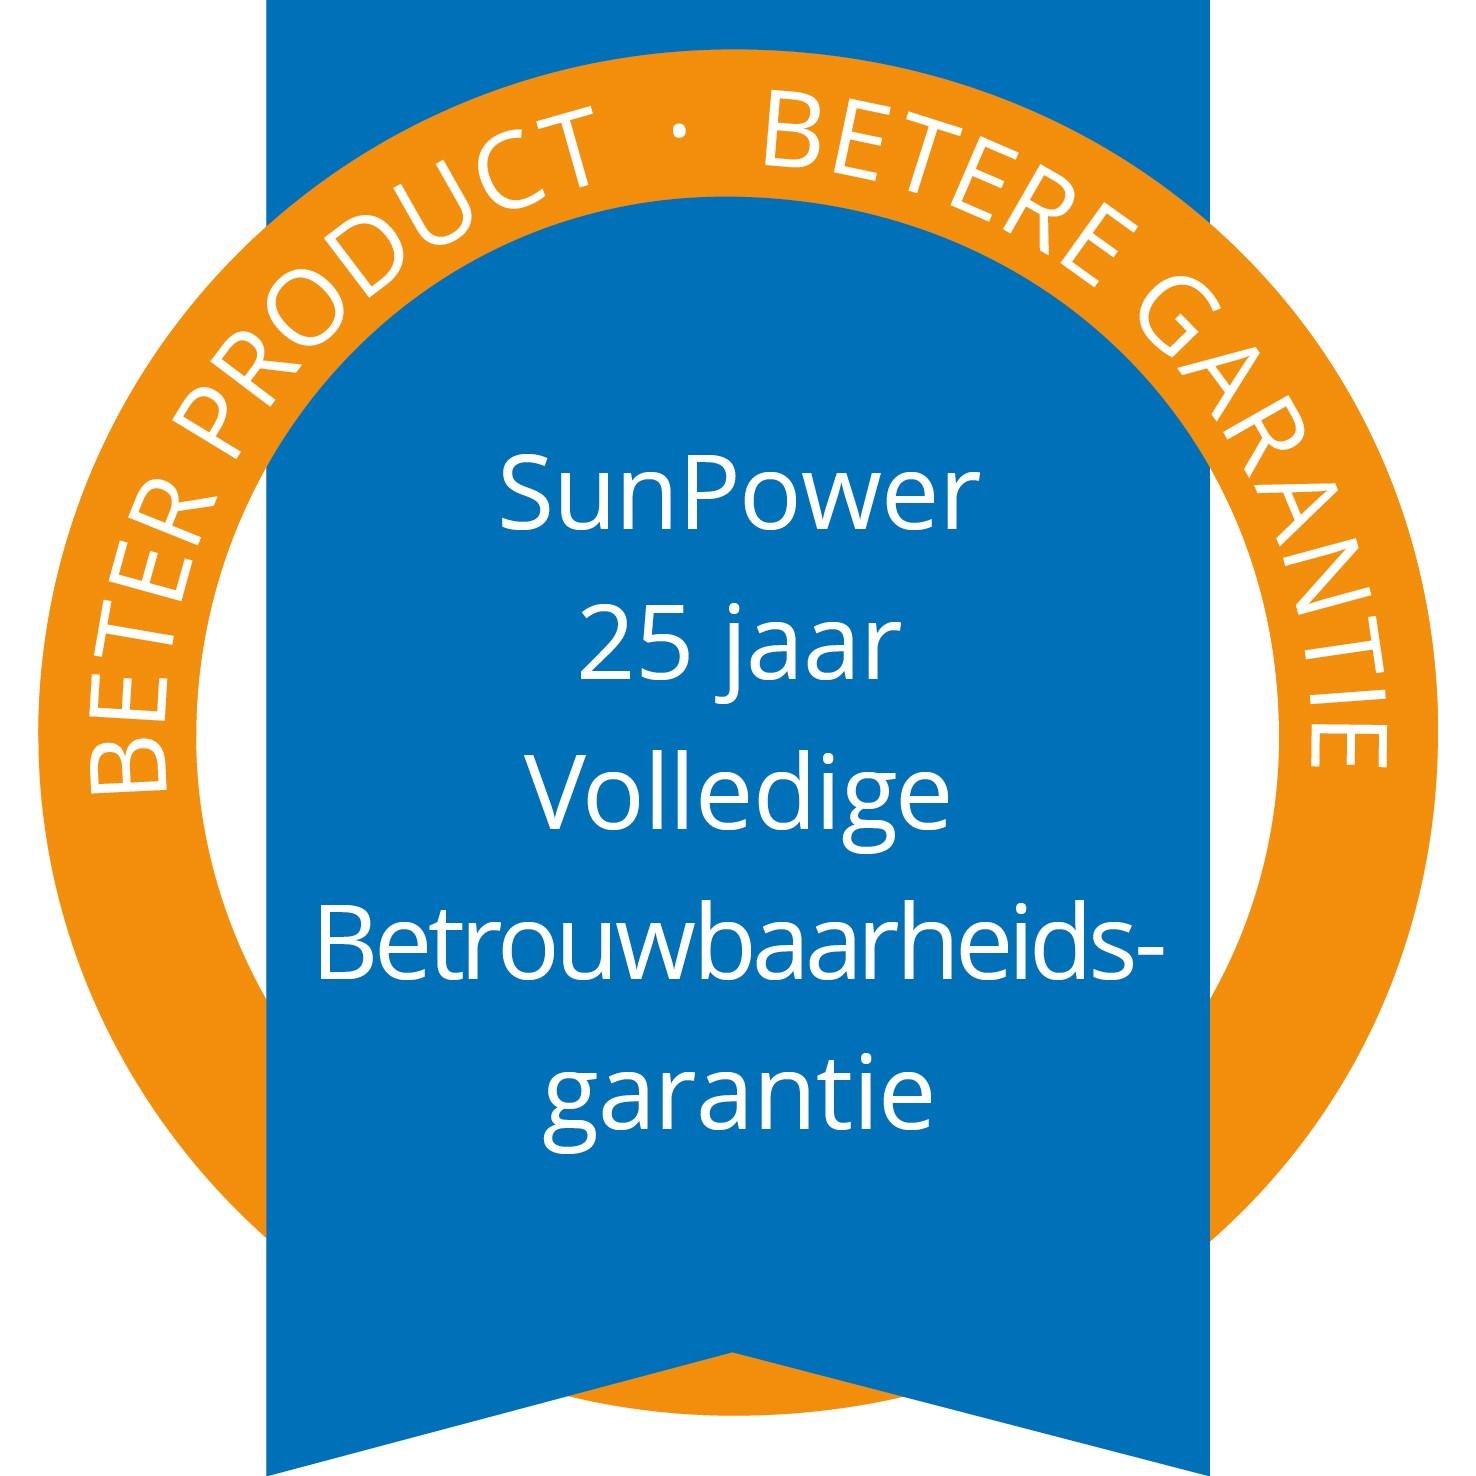 Sunpower Solar Complete warranty